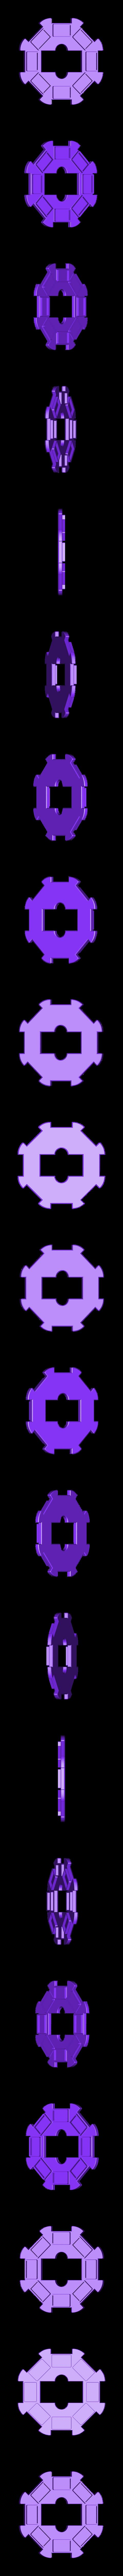 Mexican_Train_Hub.STL Download free STL file Mexican Train Domino Hub • 3D printer object, sthone